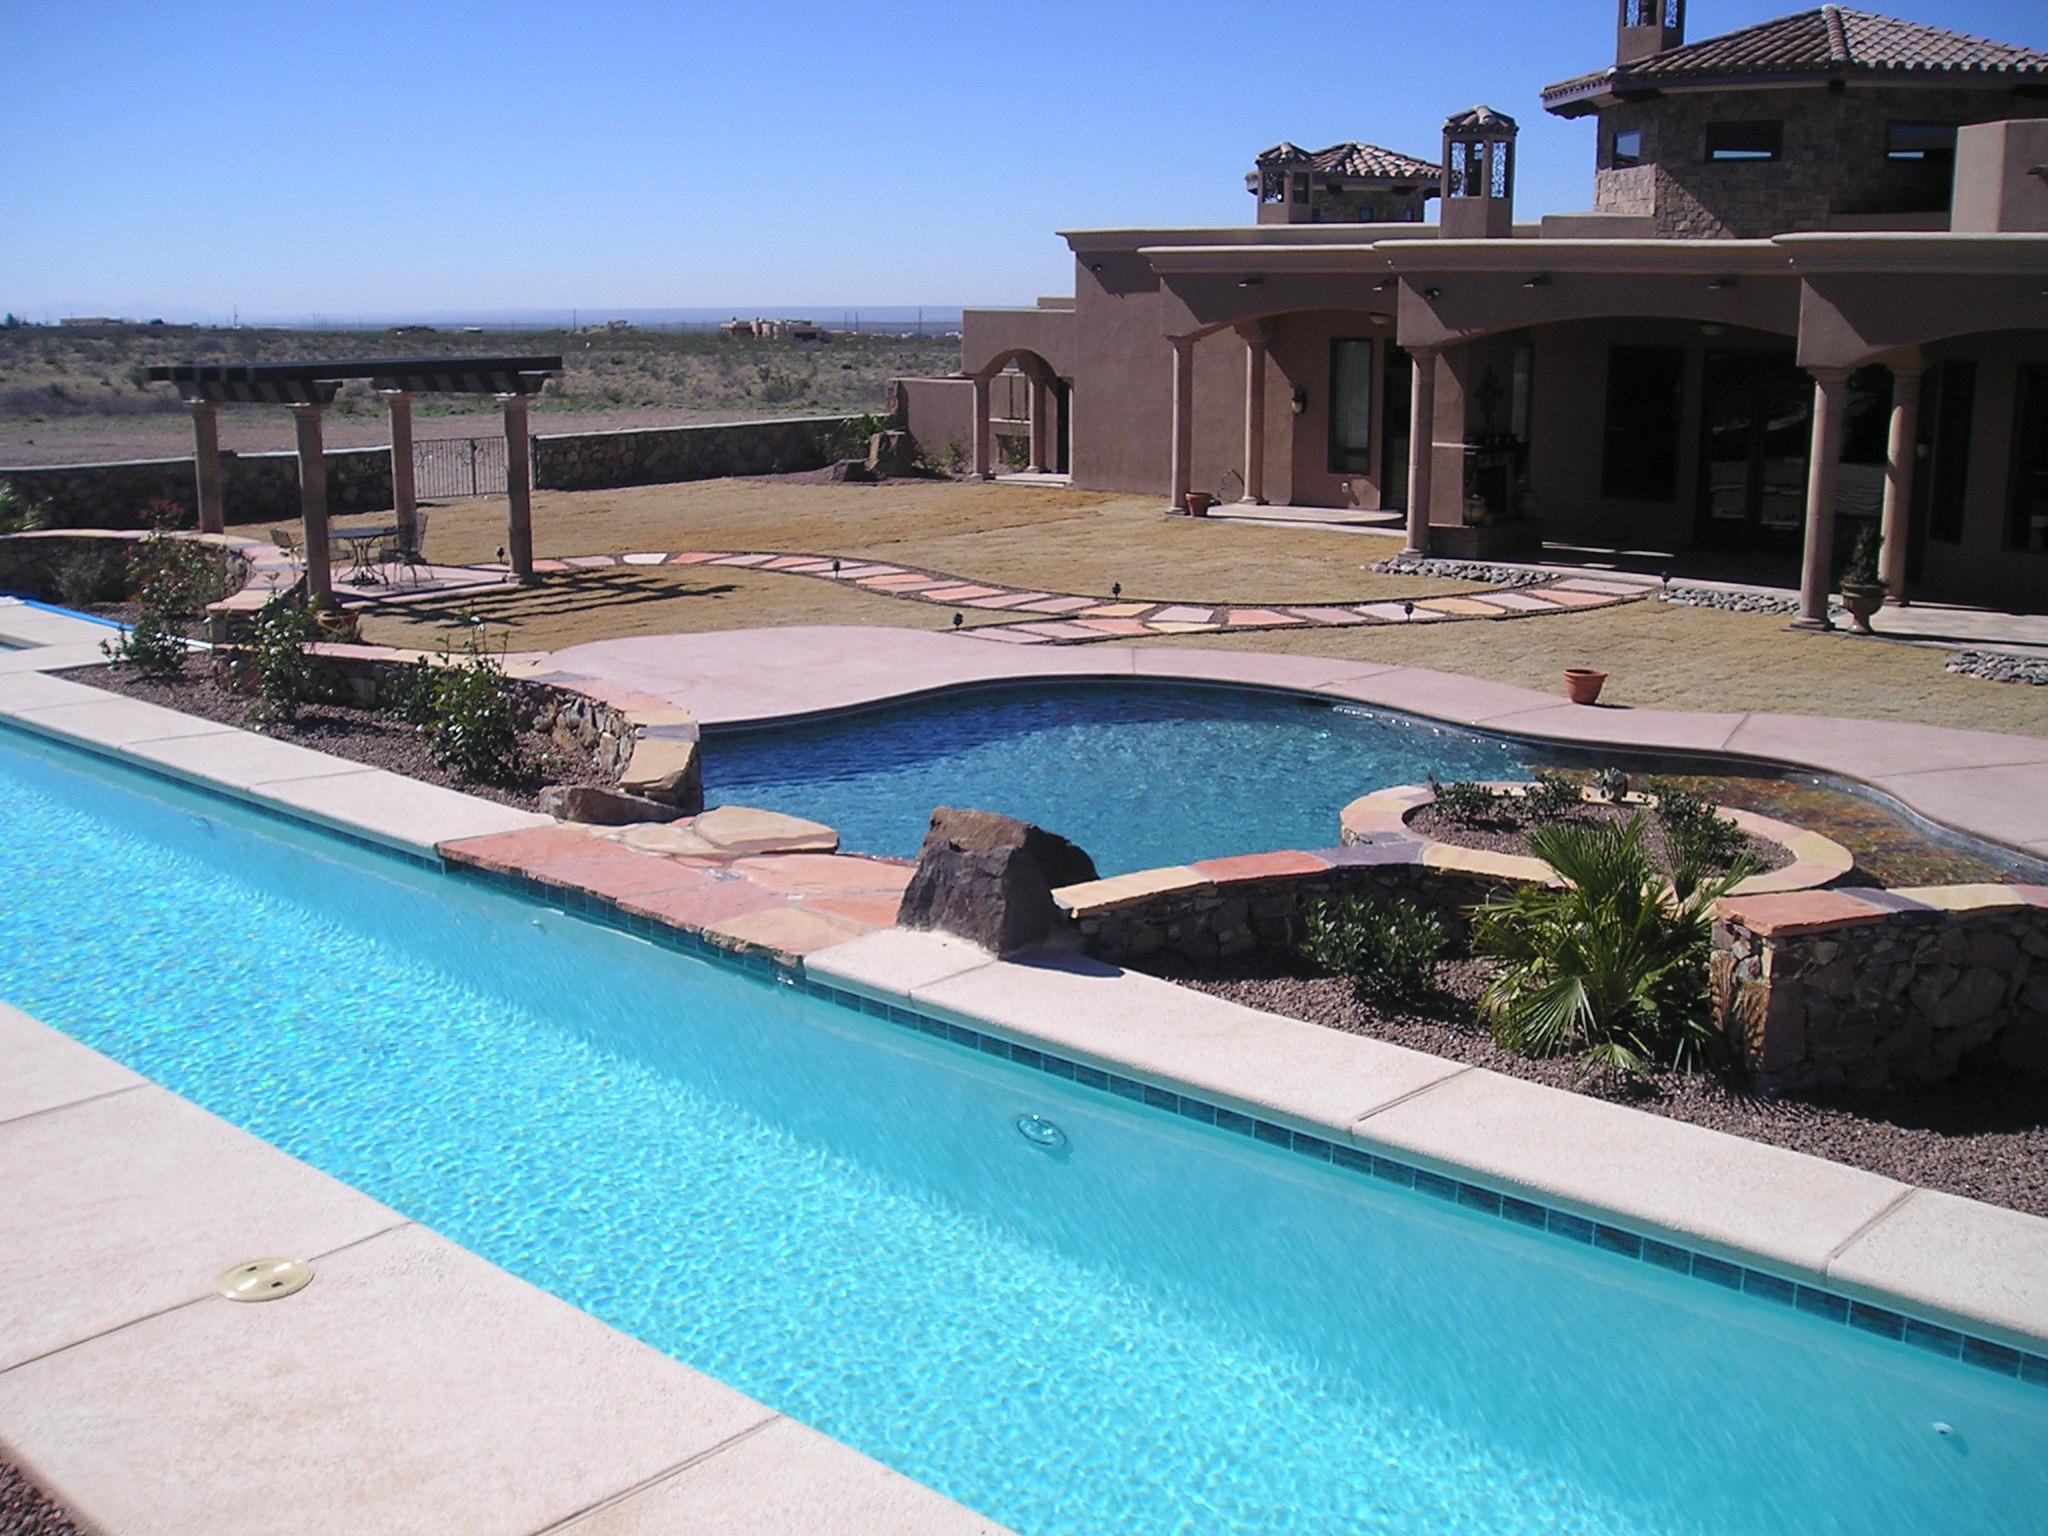 Olympus digital camera paradise pools of el paso for Pool design el paso tx